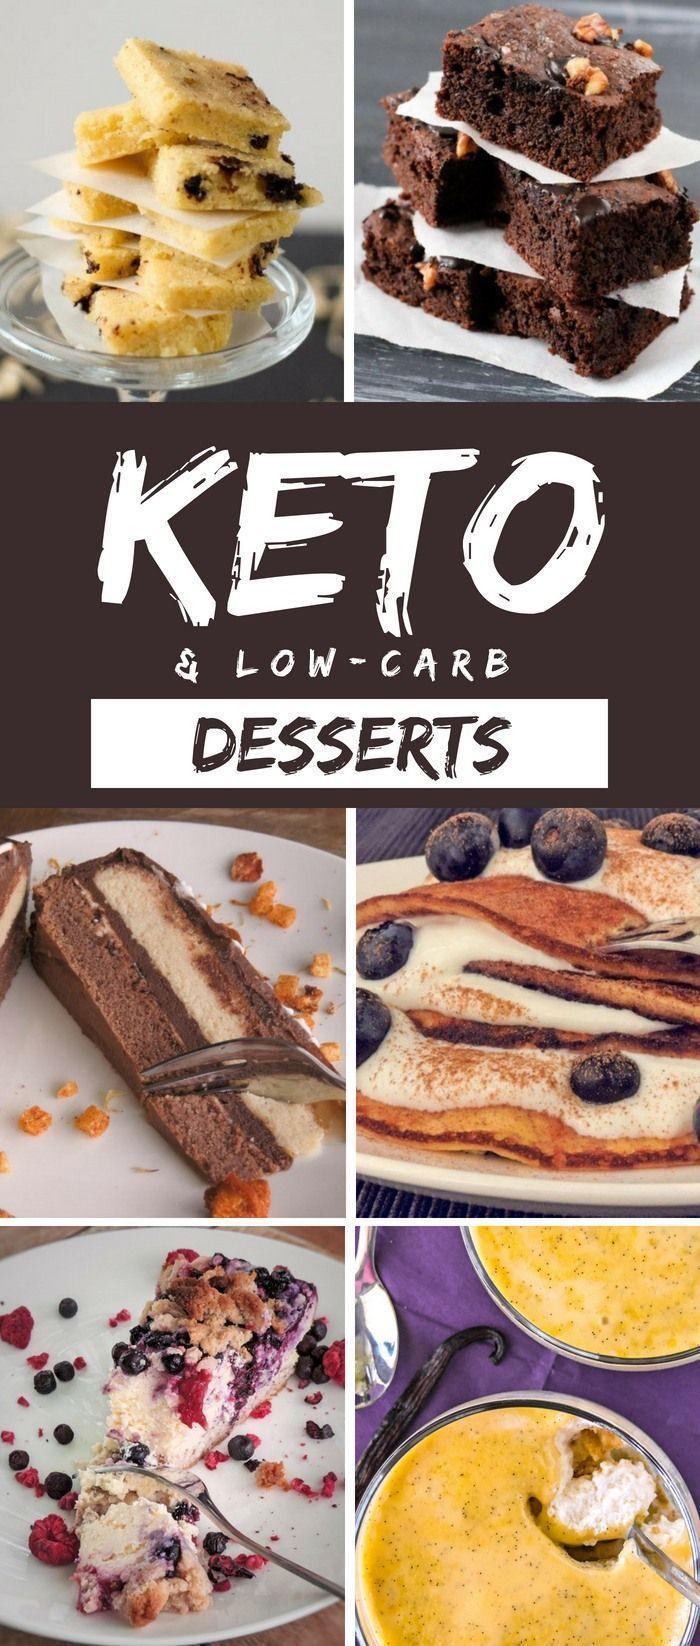 217 Recipe Tasty Easy Pancakes: 20 Tasty Keto Dessert Recipes In 2019